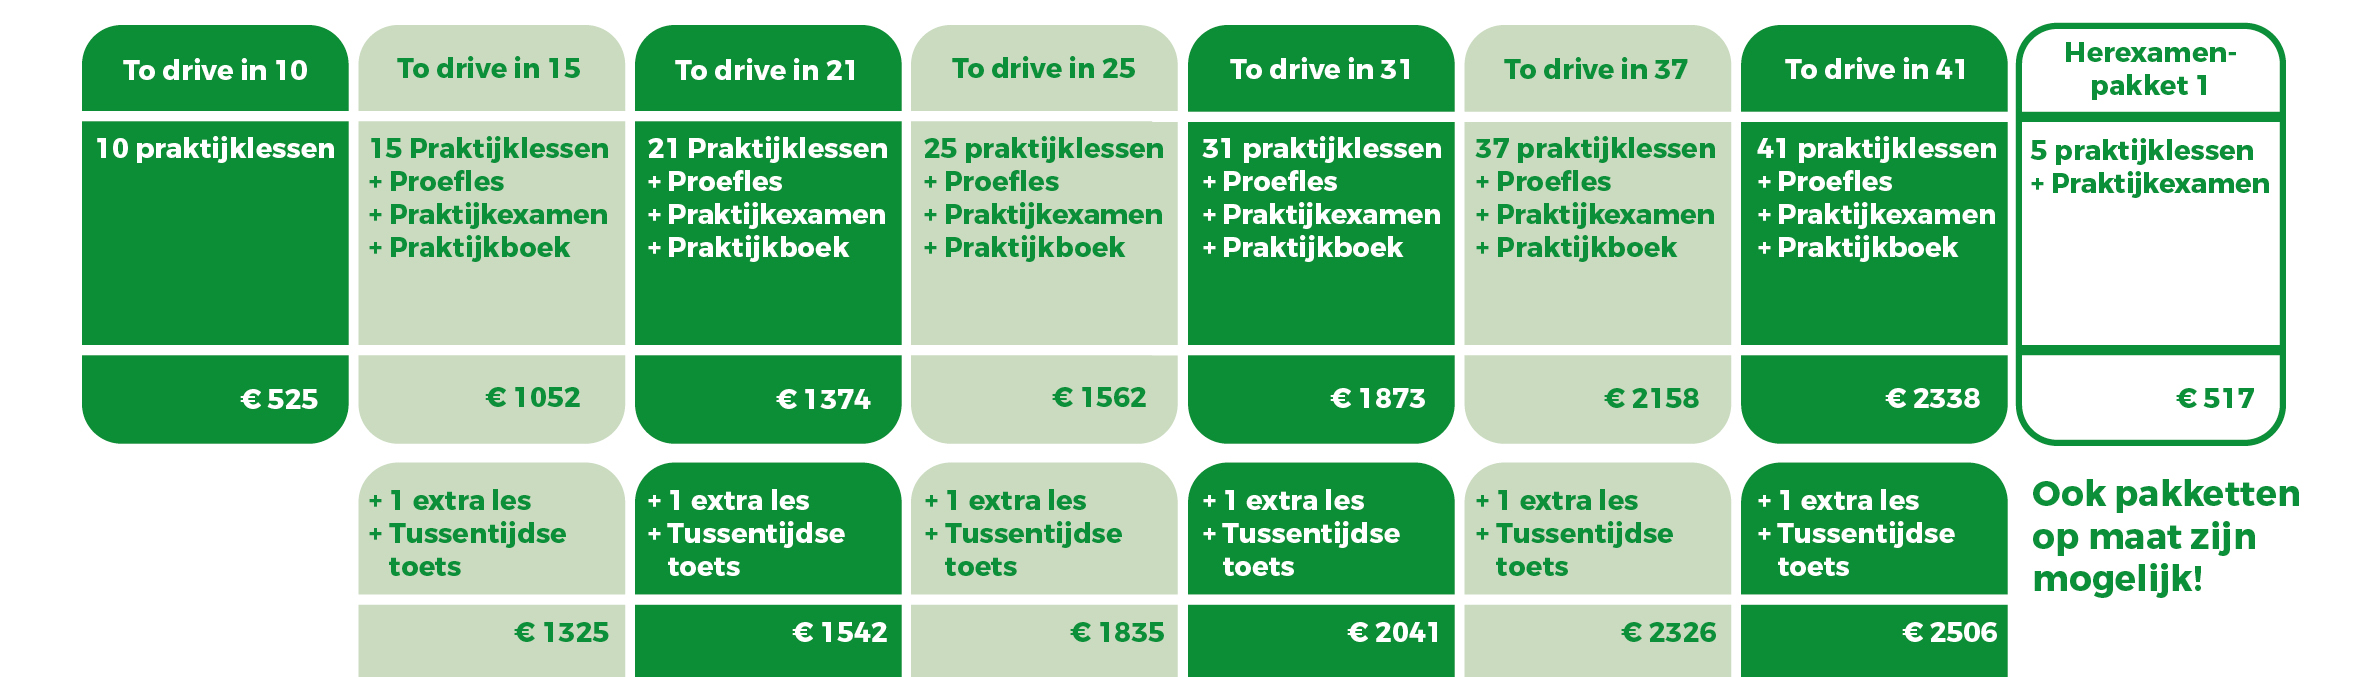 Autorijschool Ed To Drive - ETD_Header_prijzen_+1xtra_2021_V1.jpg